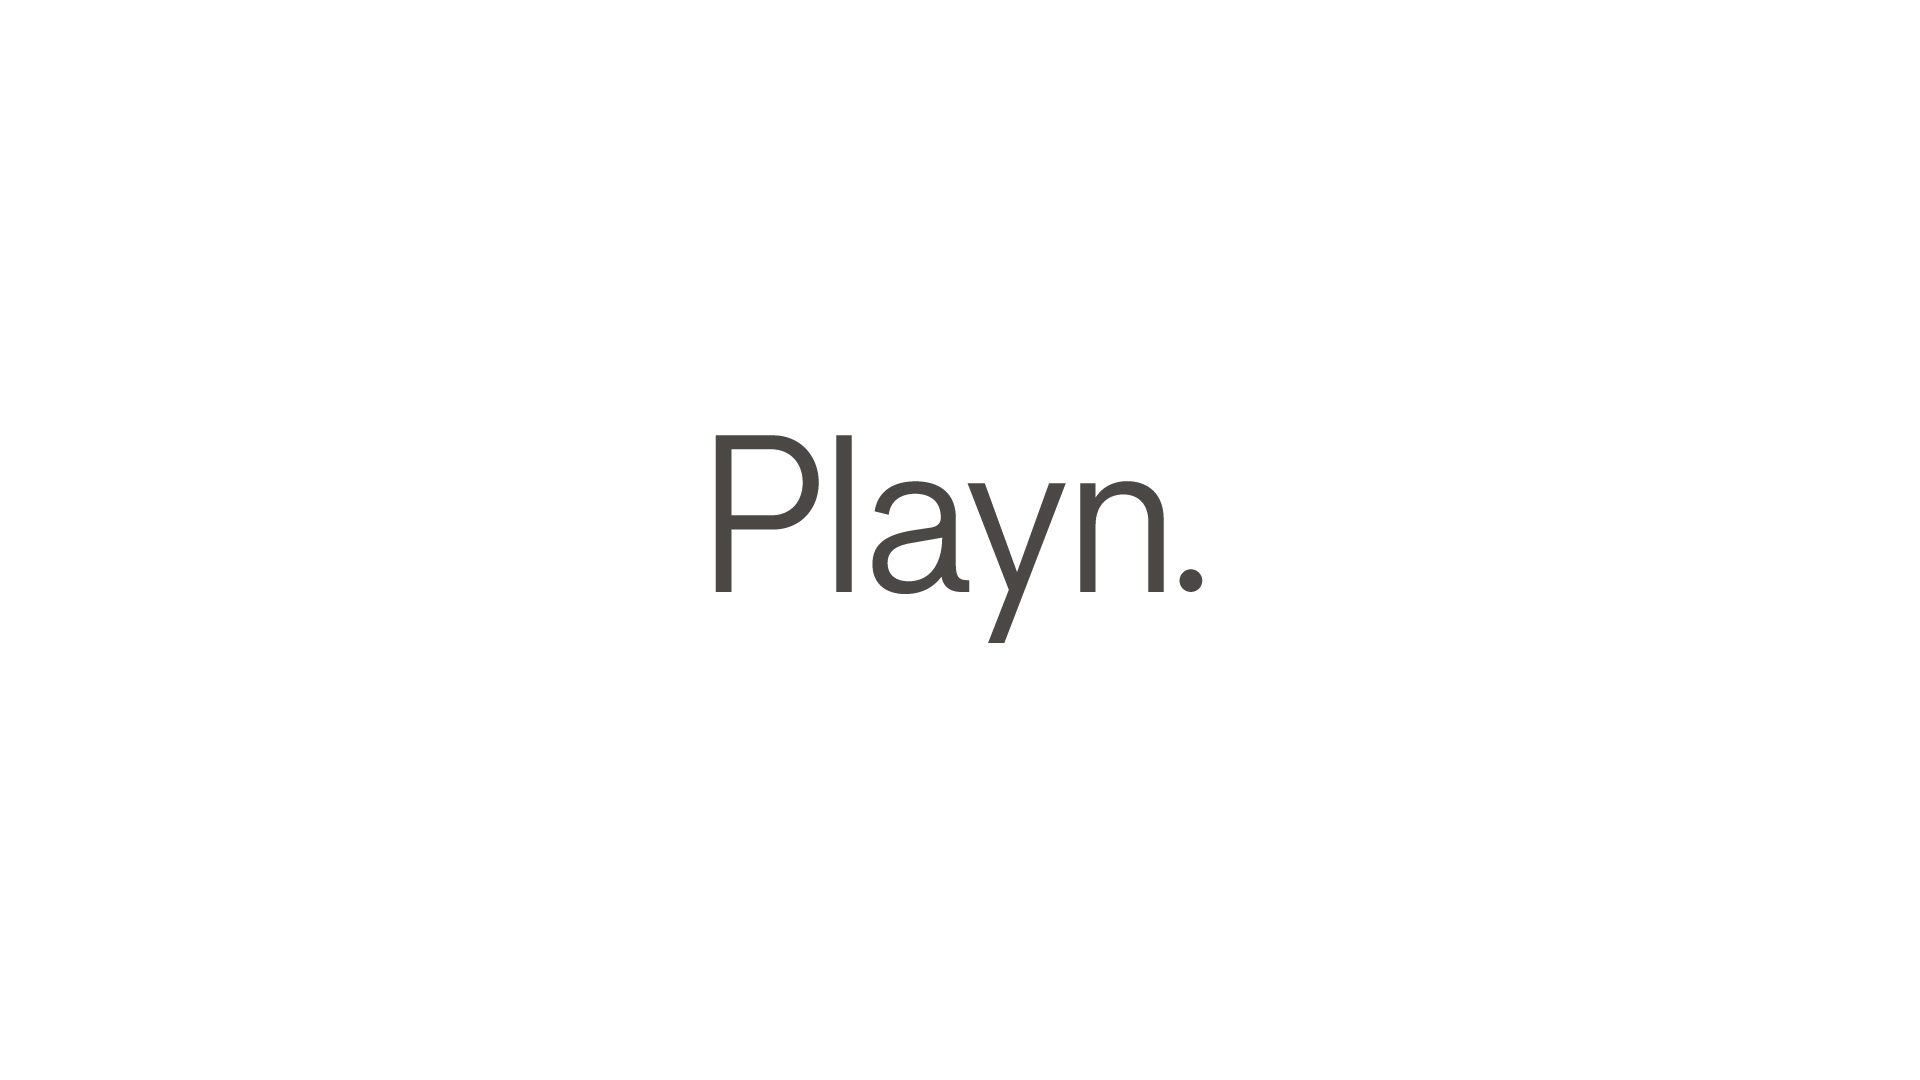 Playn. logo-black-on-white